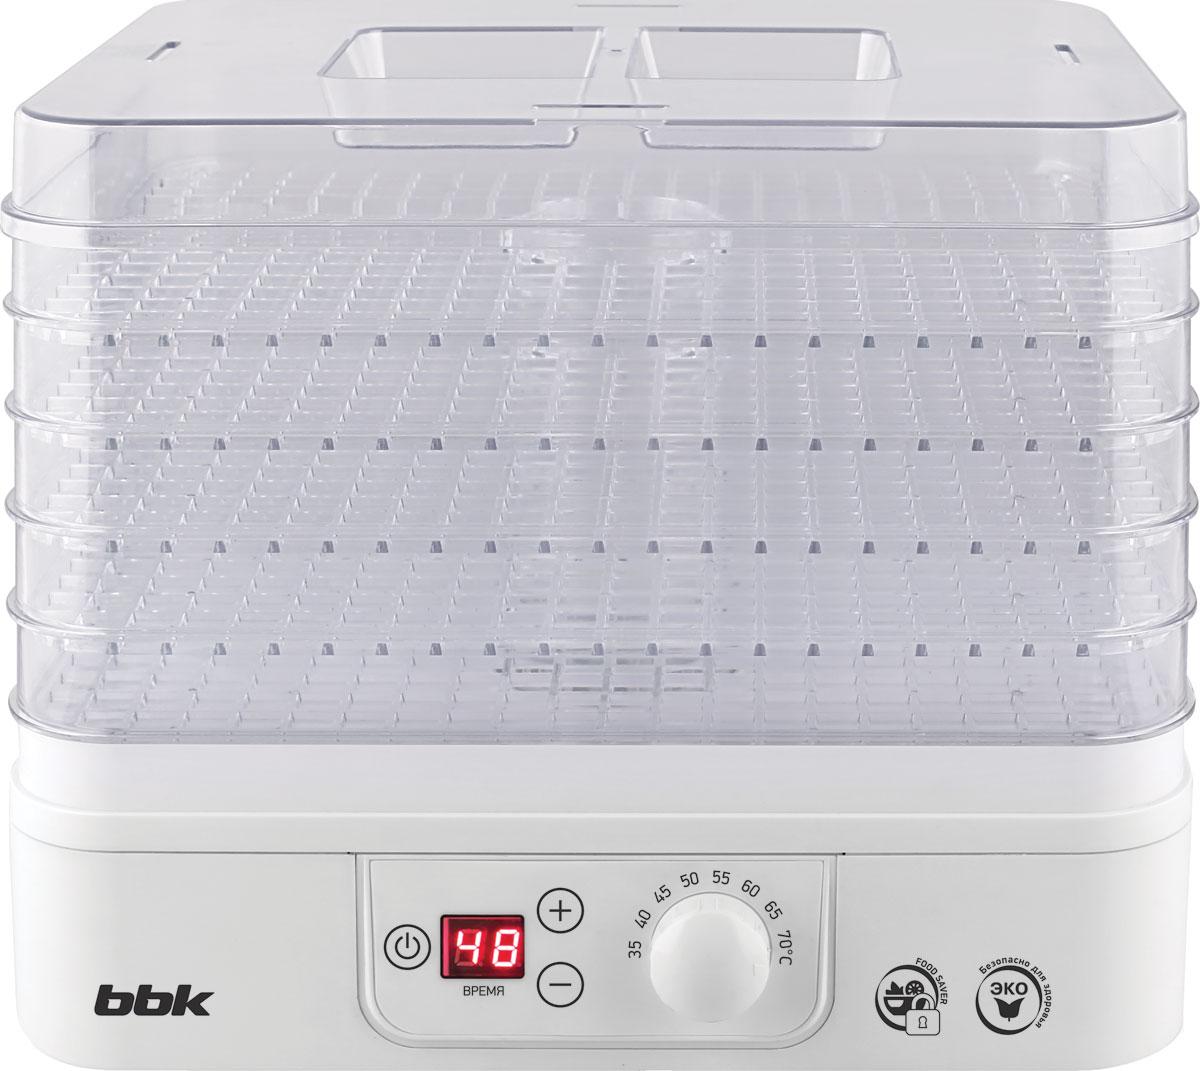 BBK BDH303D, White сушка для овощей - Техника для хранения, консервации и заготовок